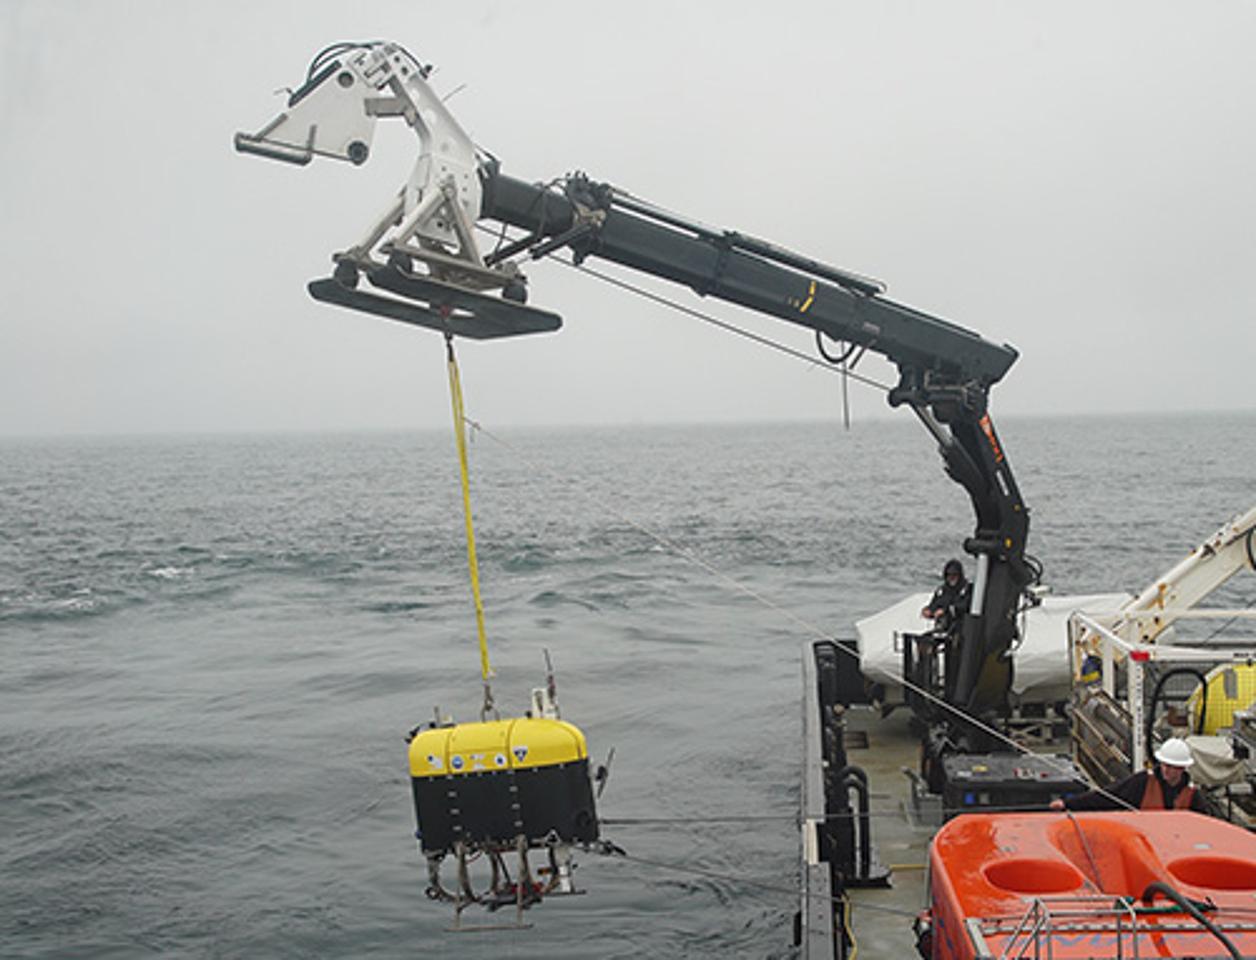 Launching theMesobot